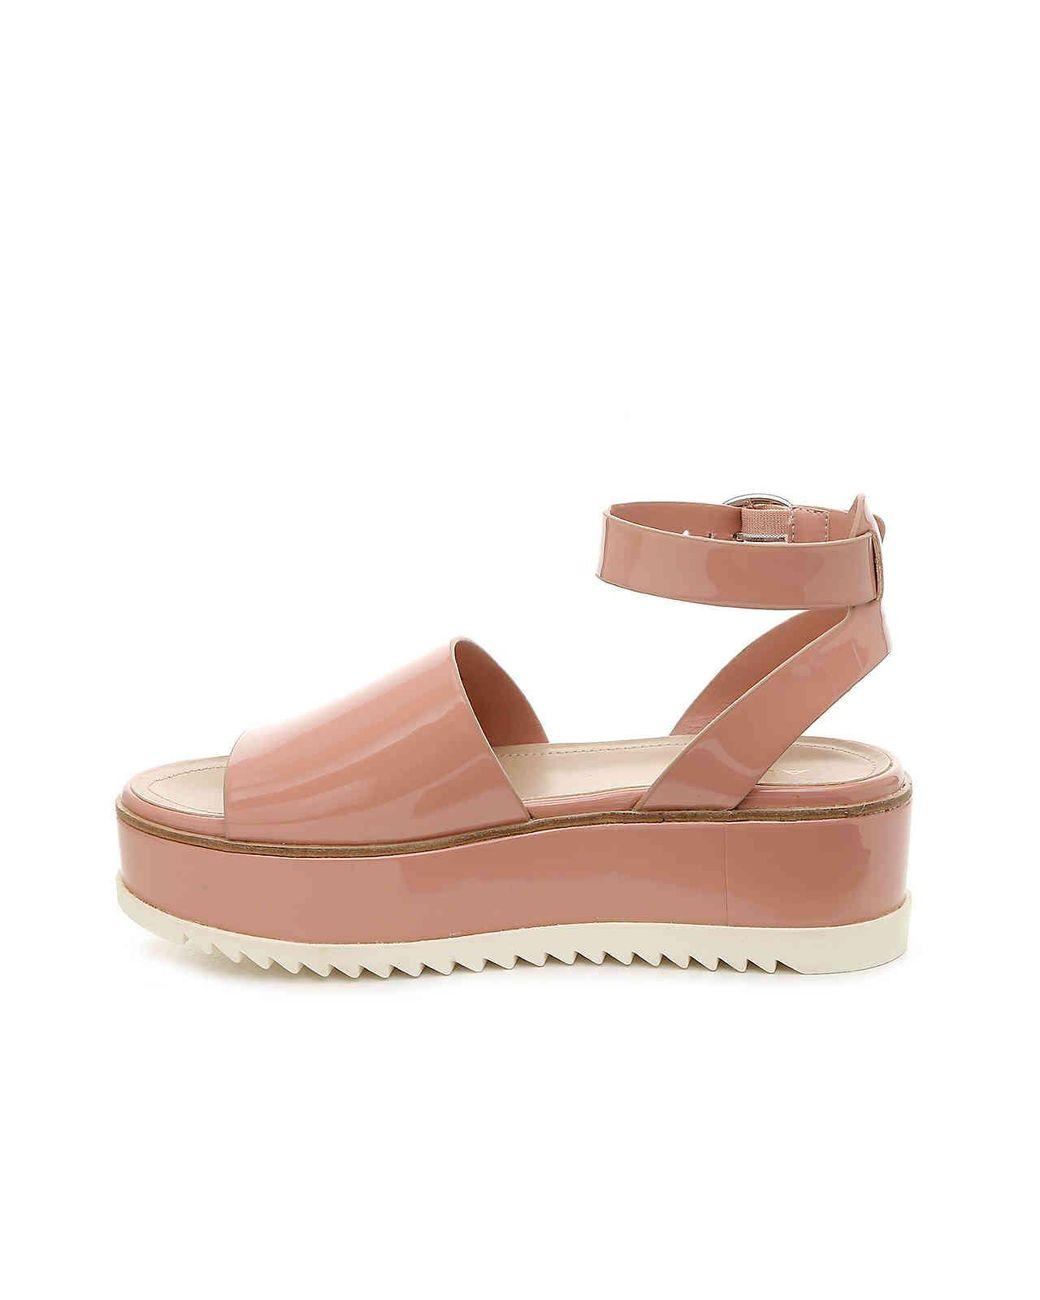 c31de7a9185 Lyst - ALDO Jadde Platform Sandal in Pink